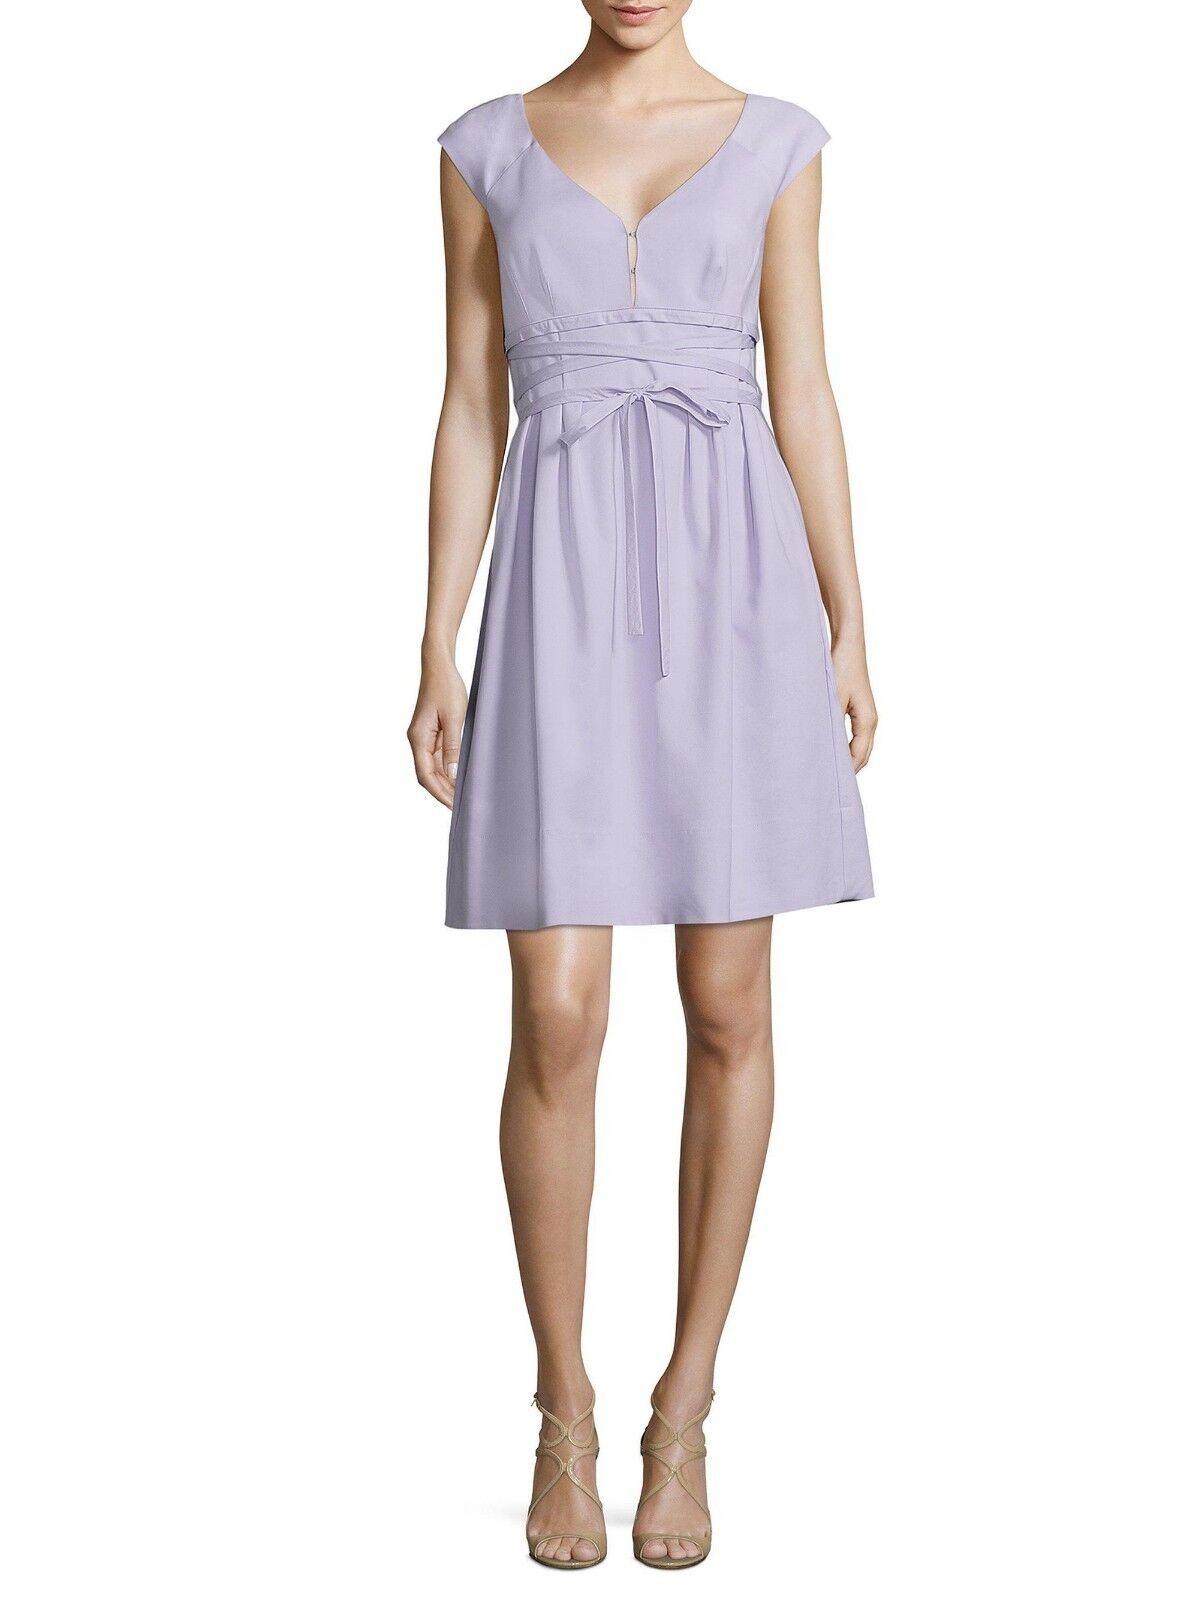 Nanette Nanette Lepore Womens Pintuck Floral Daytime Casual Dress BHFO 8916